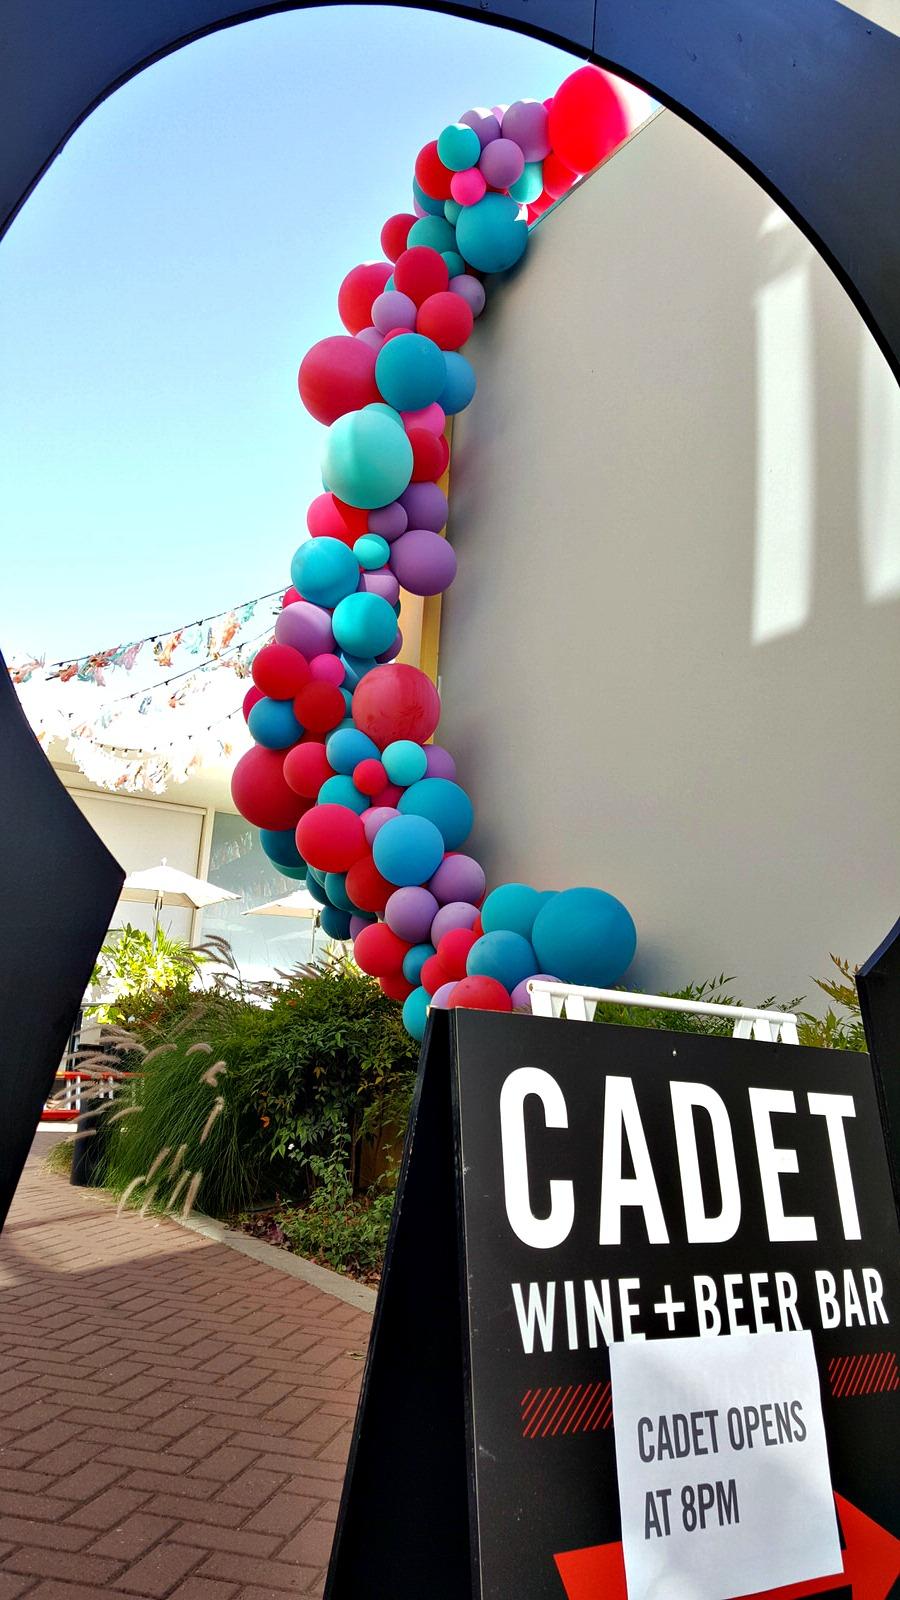 Cadet Wine Bar Balloon Garland Side View.jpg